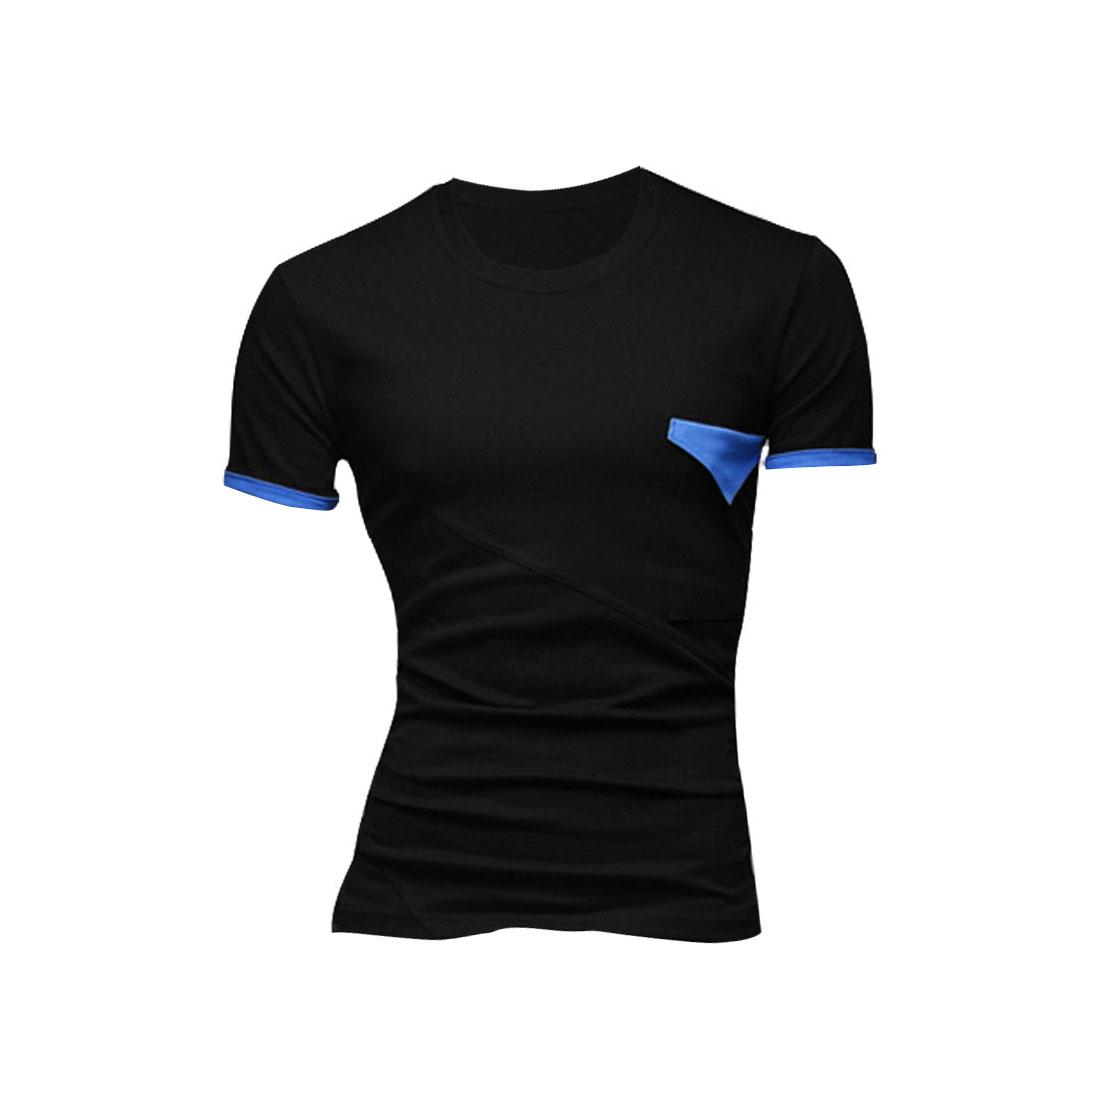 Men Round Neck Short Sleeve Chest Pocket Shirt Black M